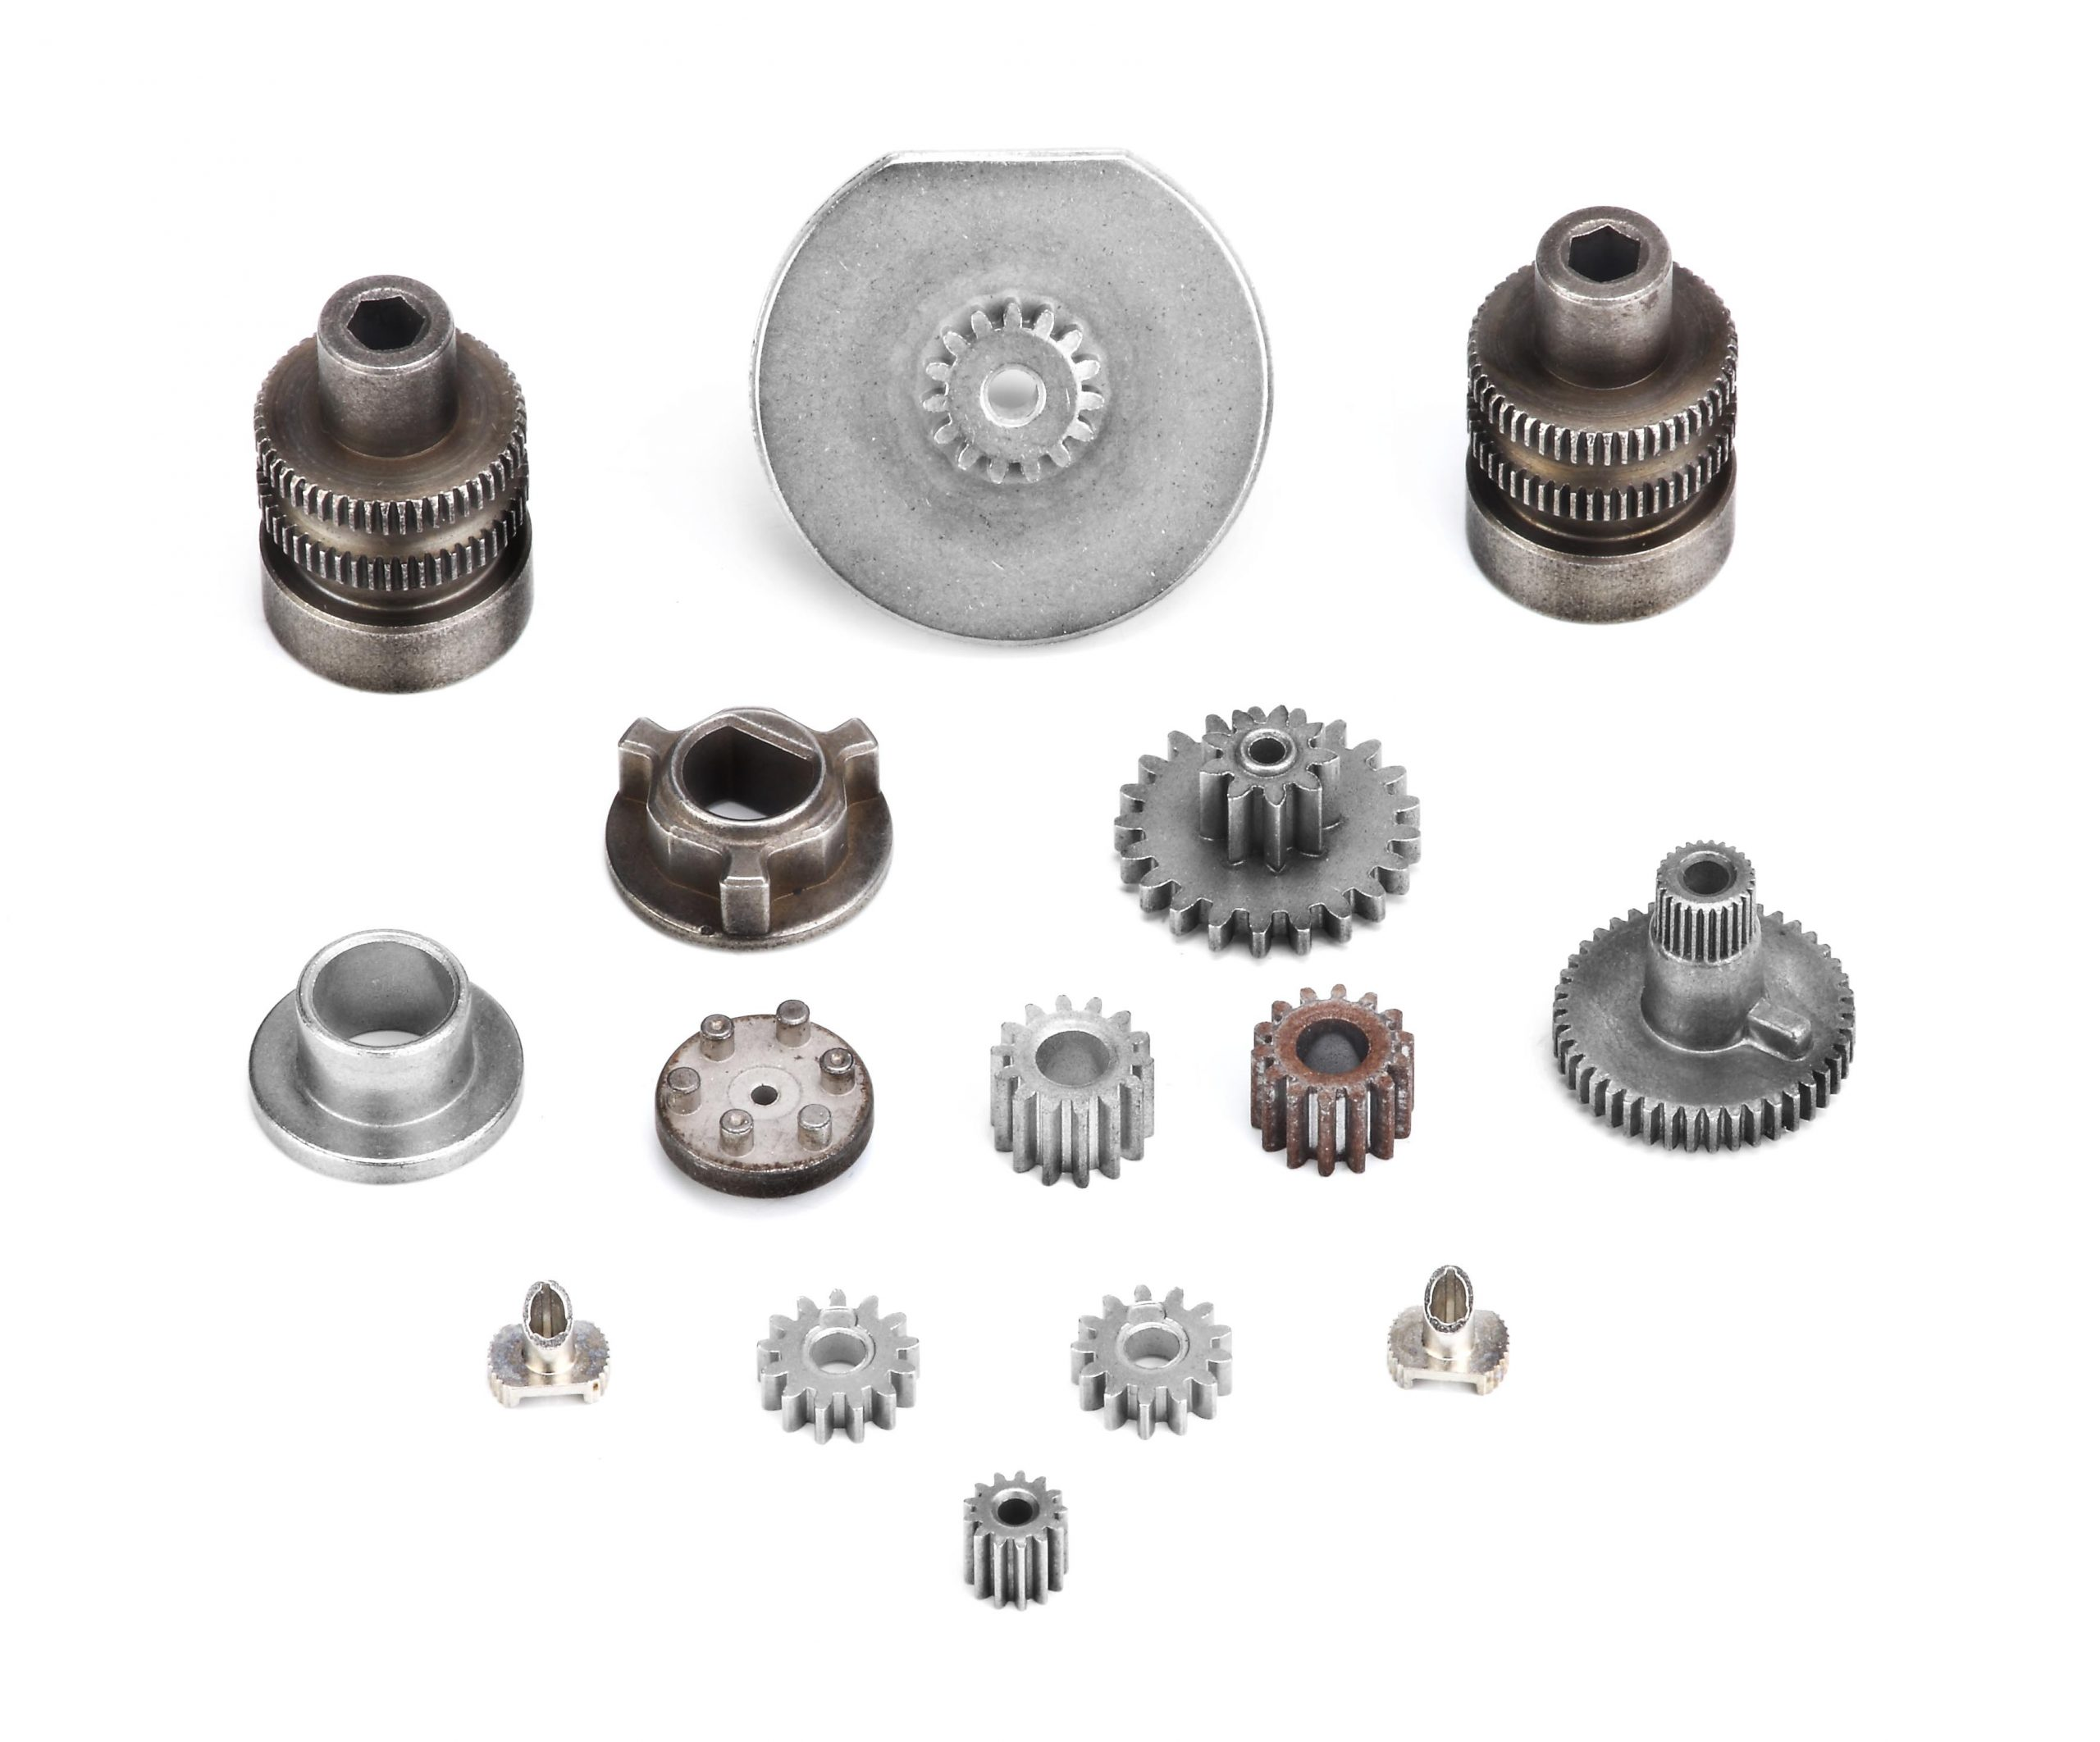 Sintered Automotive Components